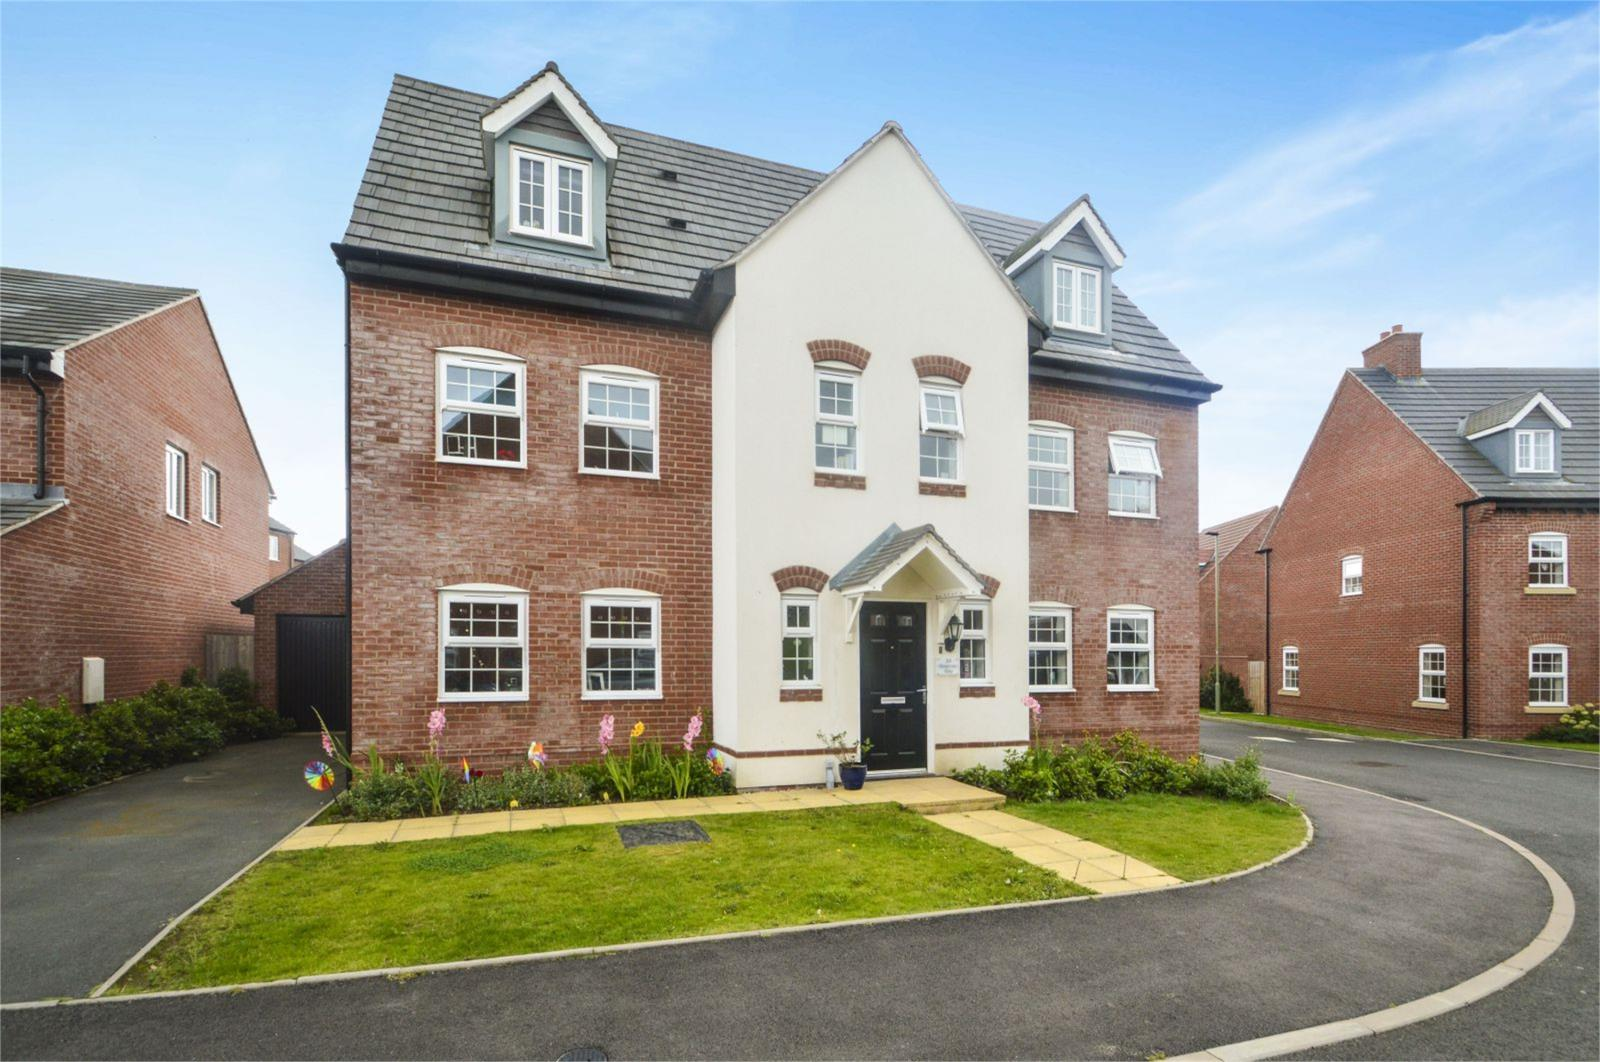 6 Bedrooms Detached House for sale in 39 Betjeman Way, Cleobury Mortimer, Kidderminster, Shropshire, DY14